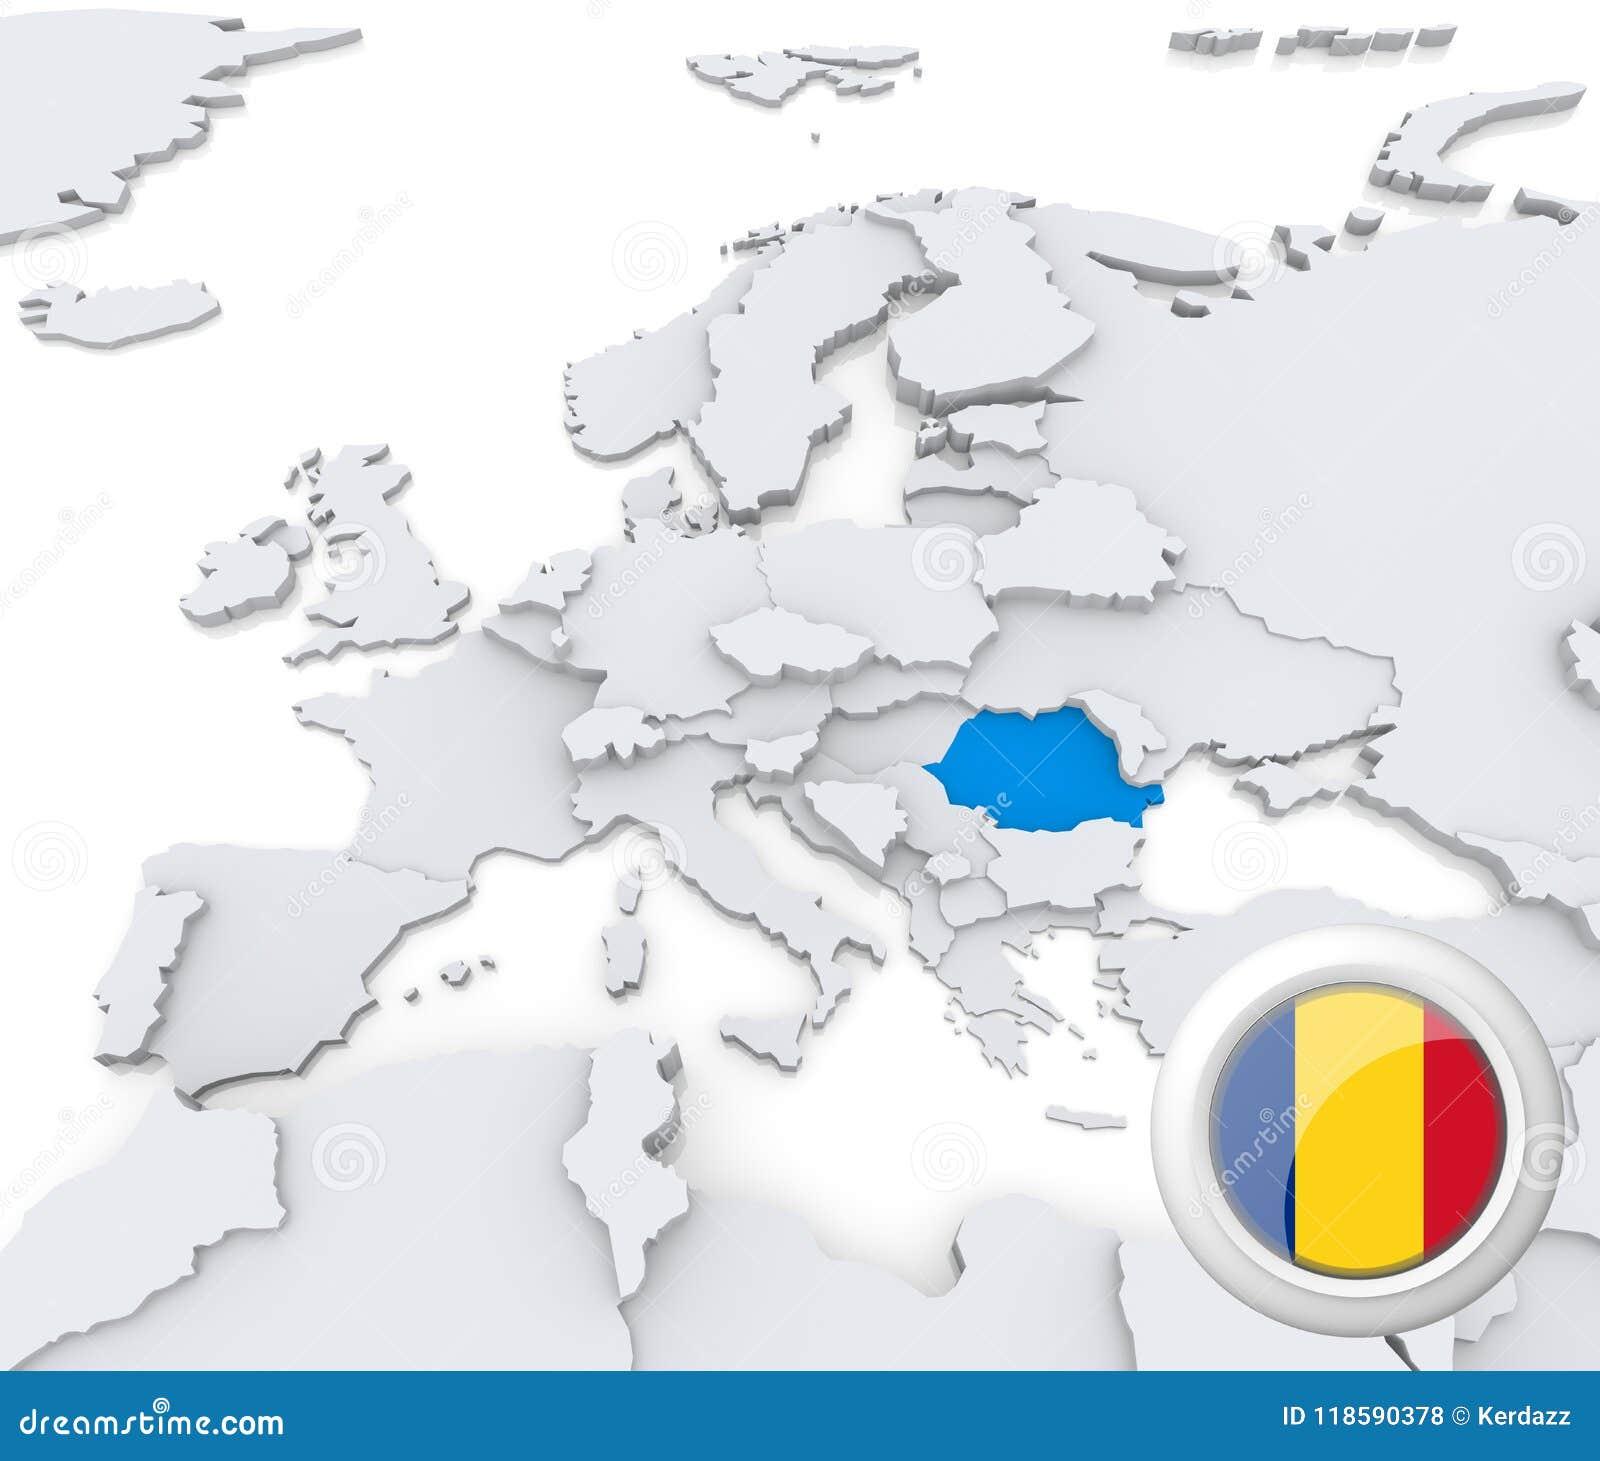 Romania On Map Of Europe.Romania On Map Of Europe Stock Illustration Illustration Of Romania